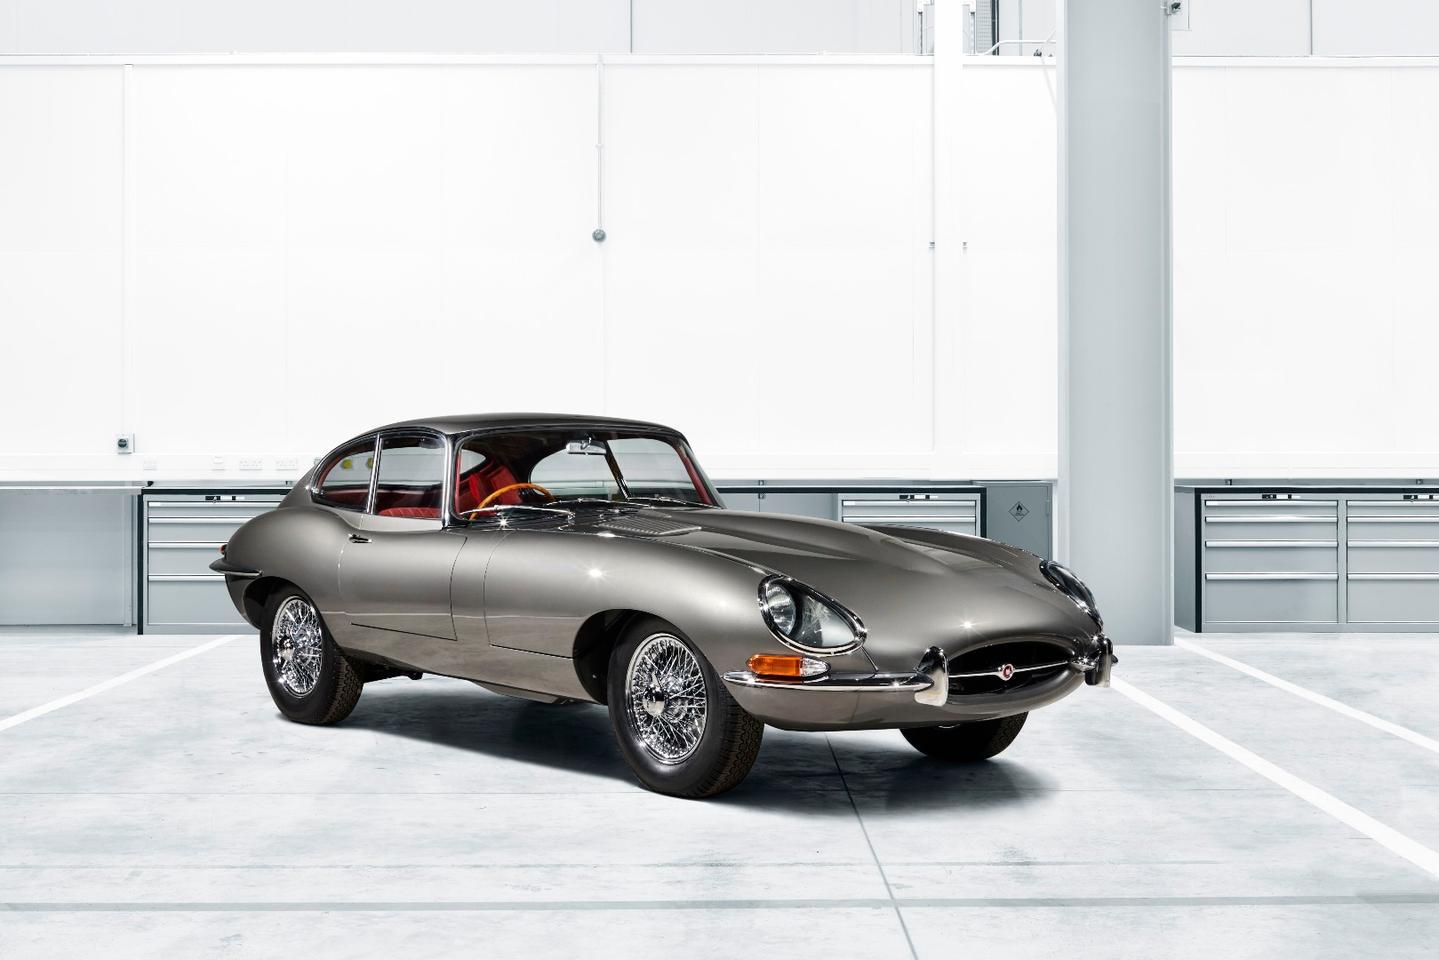 Jaguar's first E-type Reborn